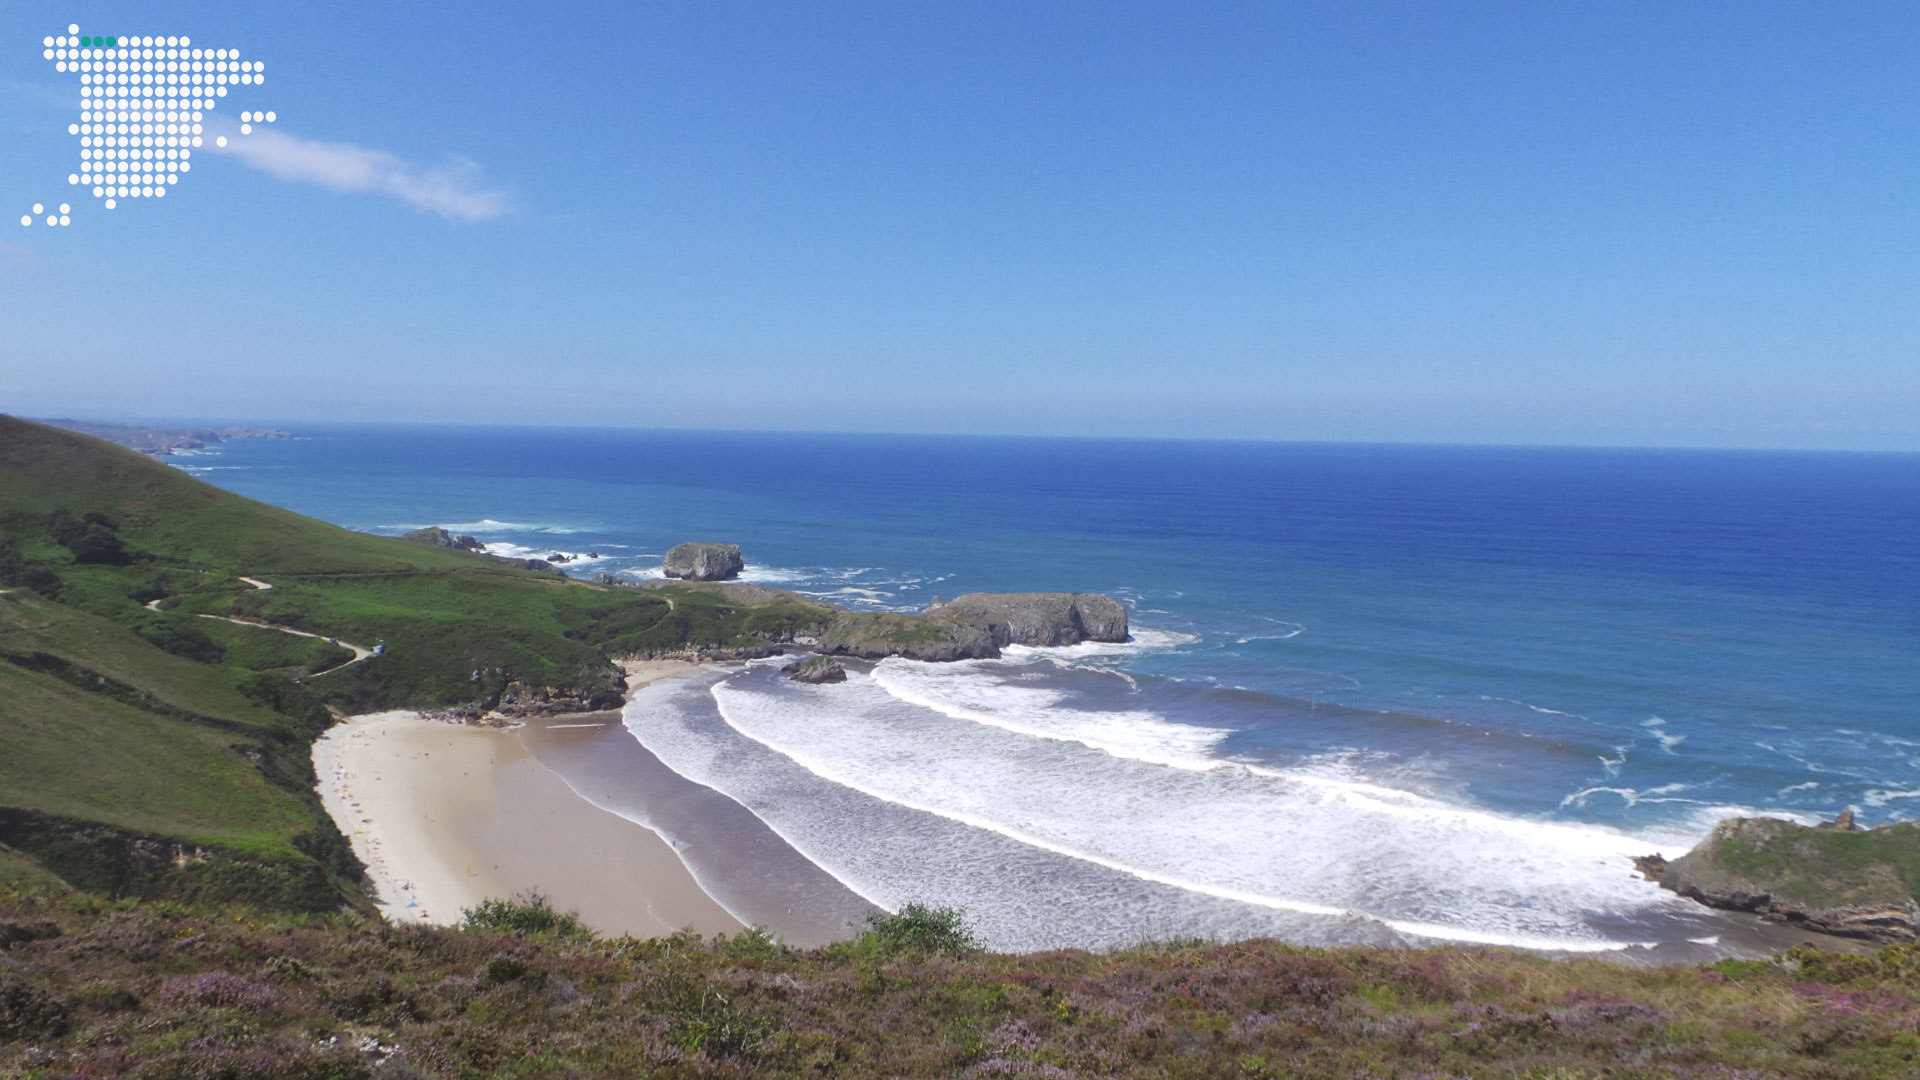 coastline_03